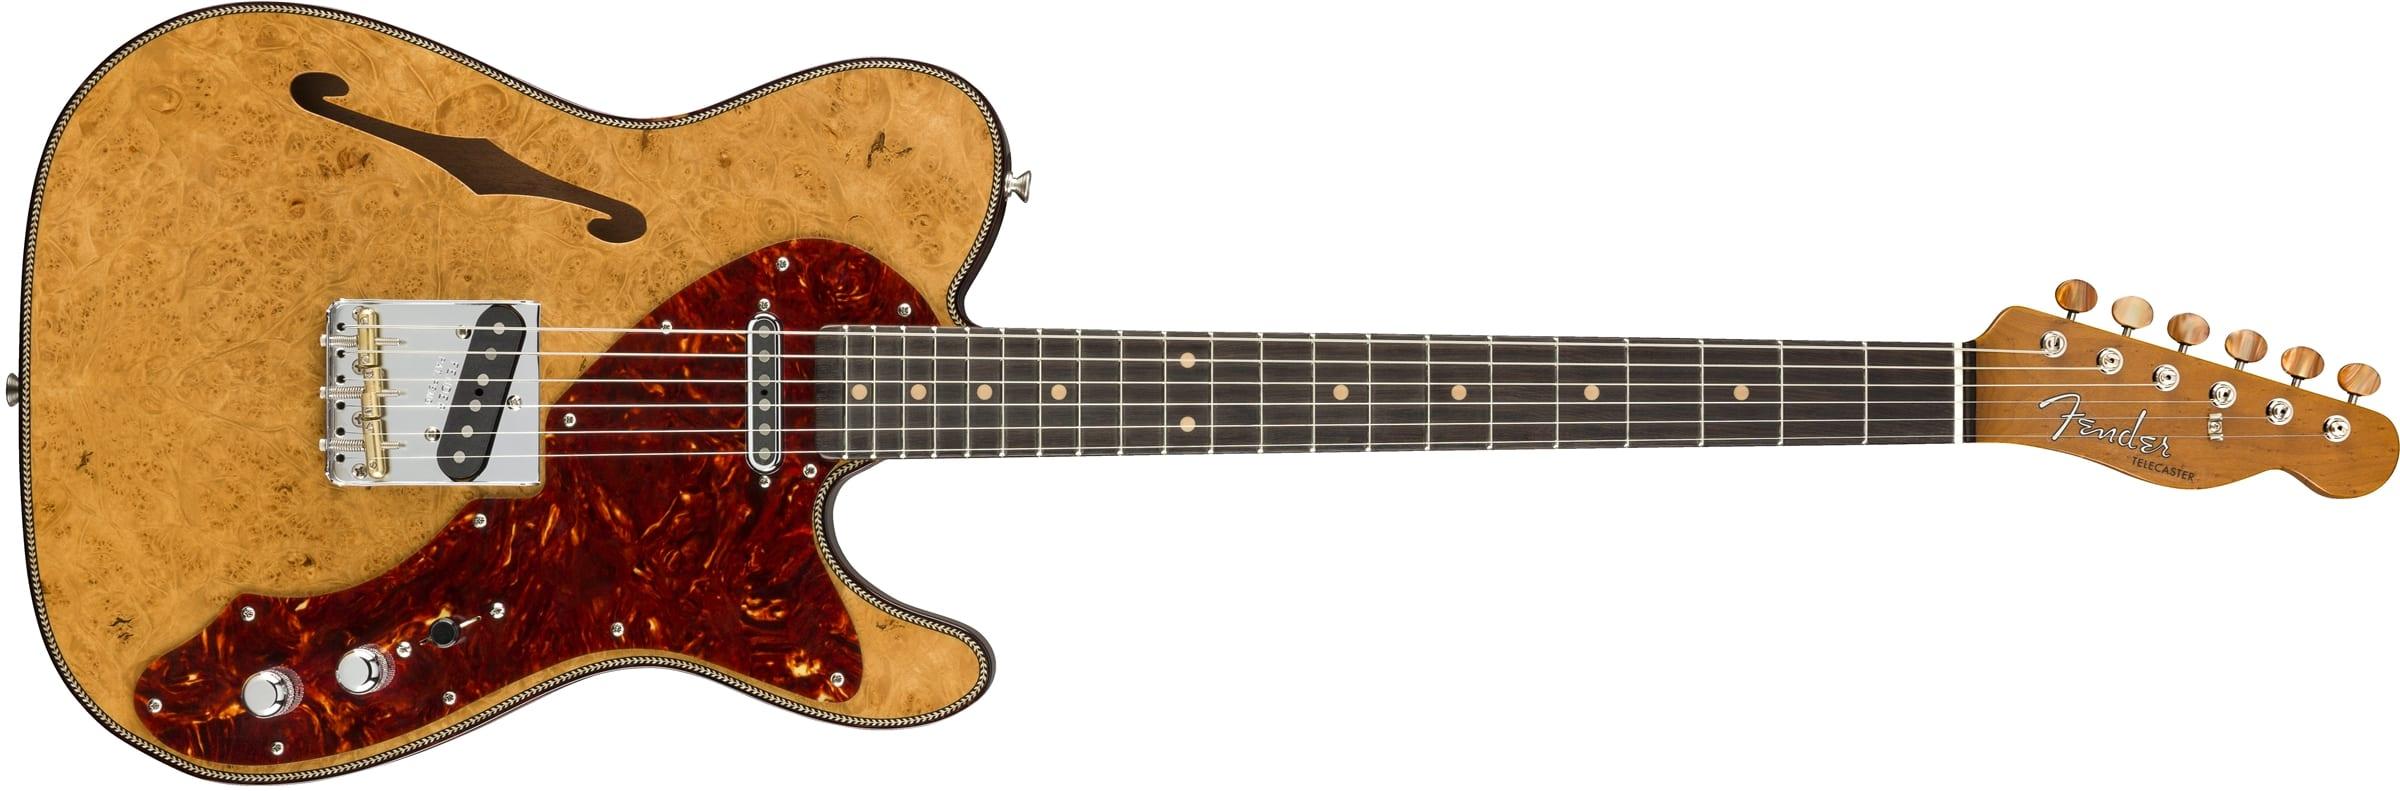 Fender Custom Shop 2018 Limited Edition Artisan Maple Burl Thinline Telecaster